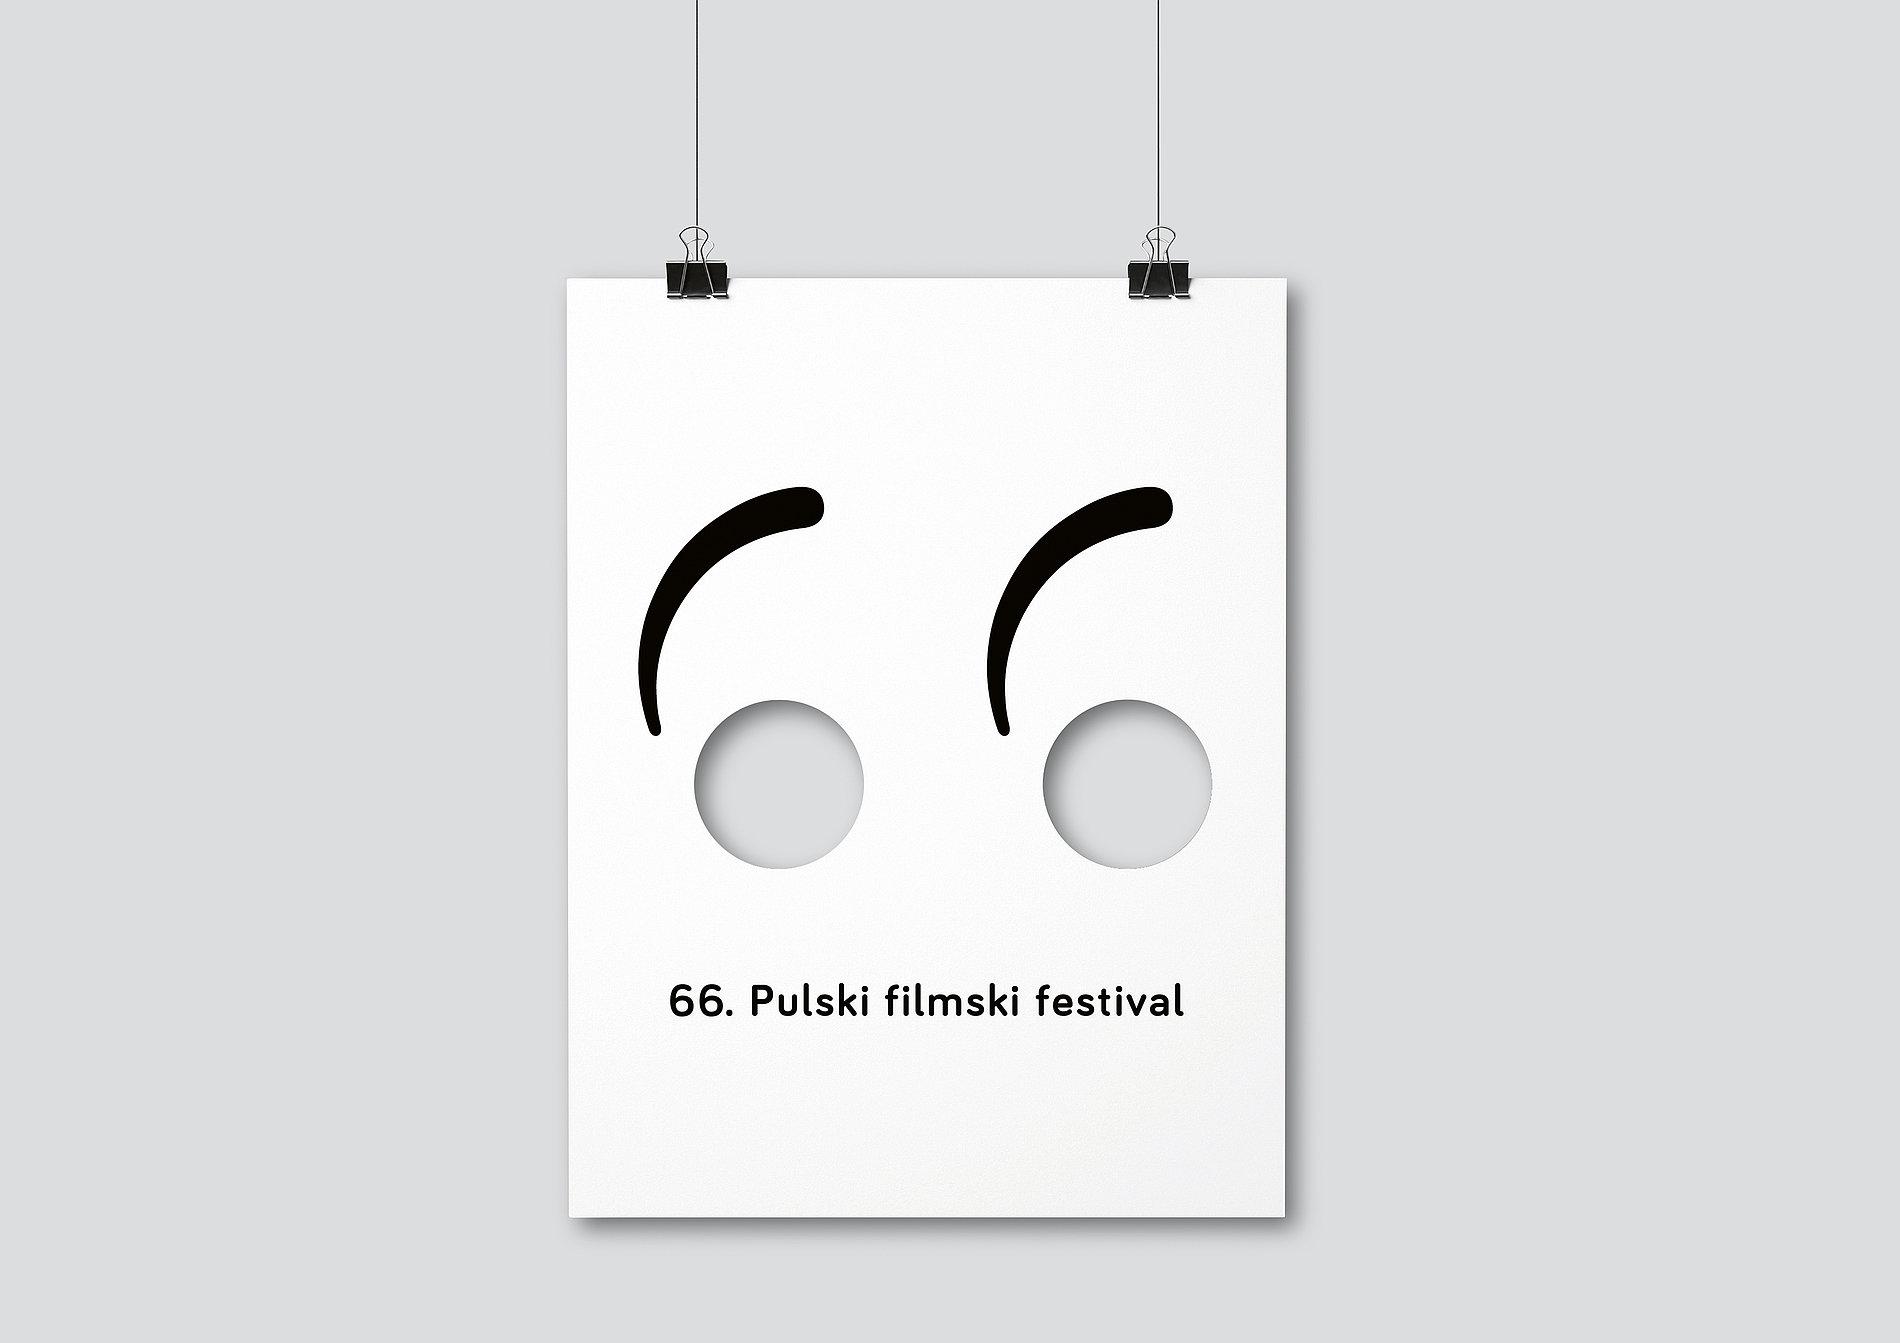 66th Pula Film Festival | Red Dot Design Award